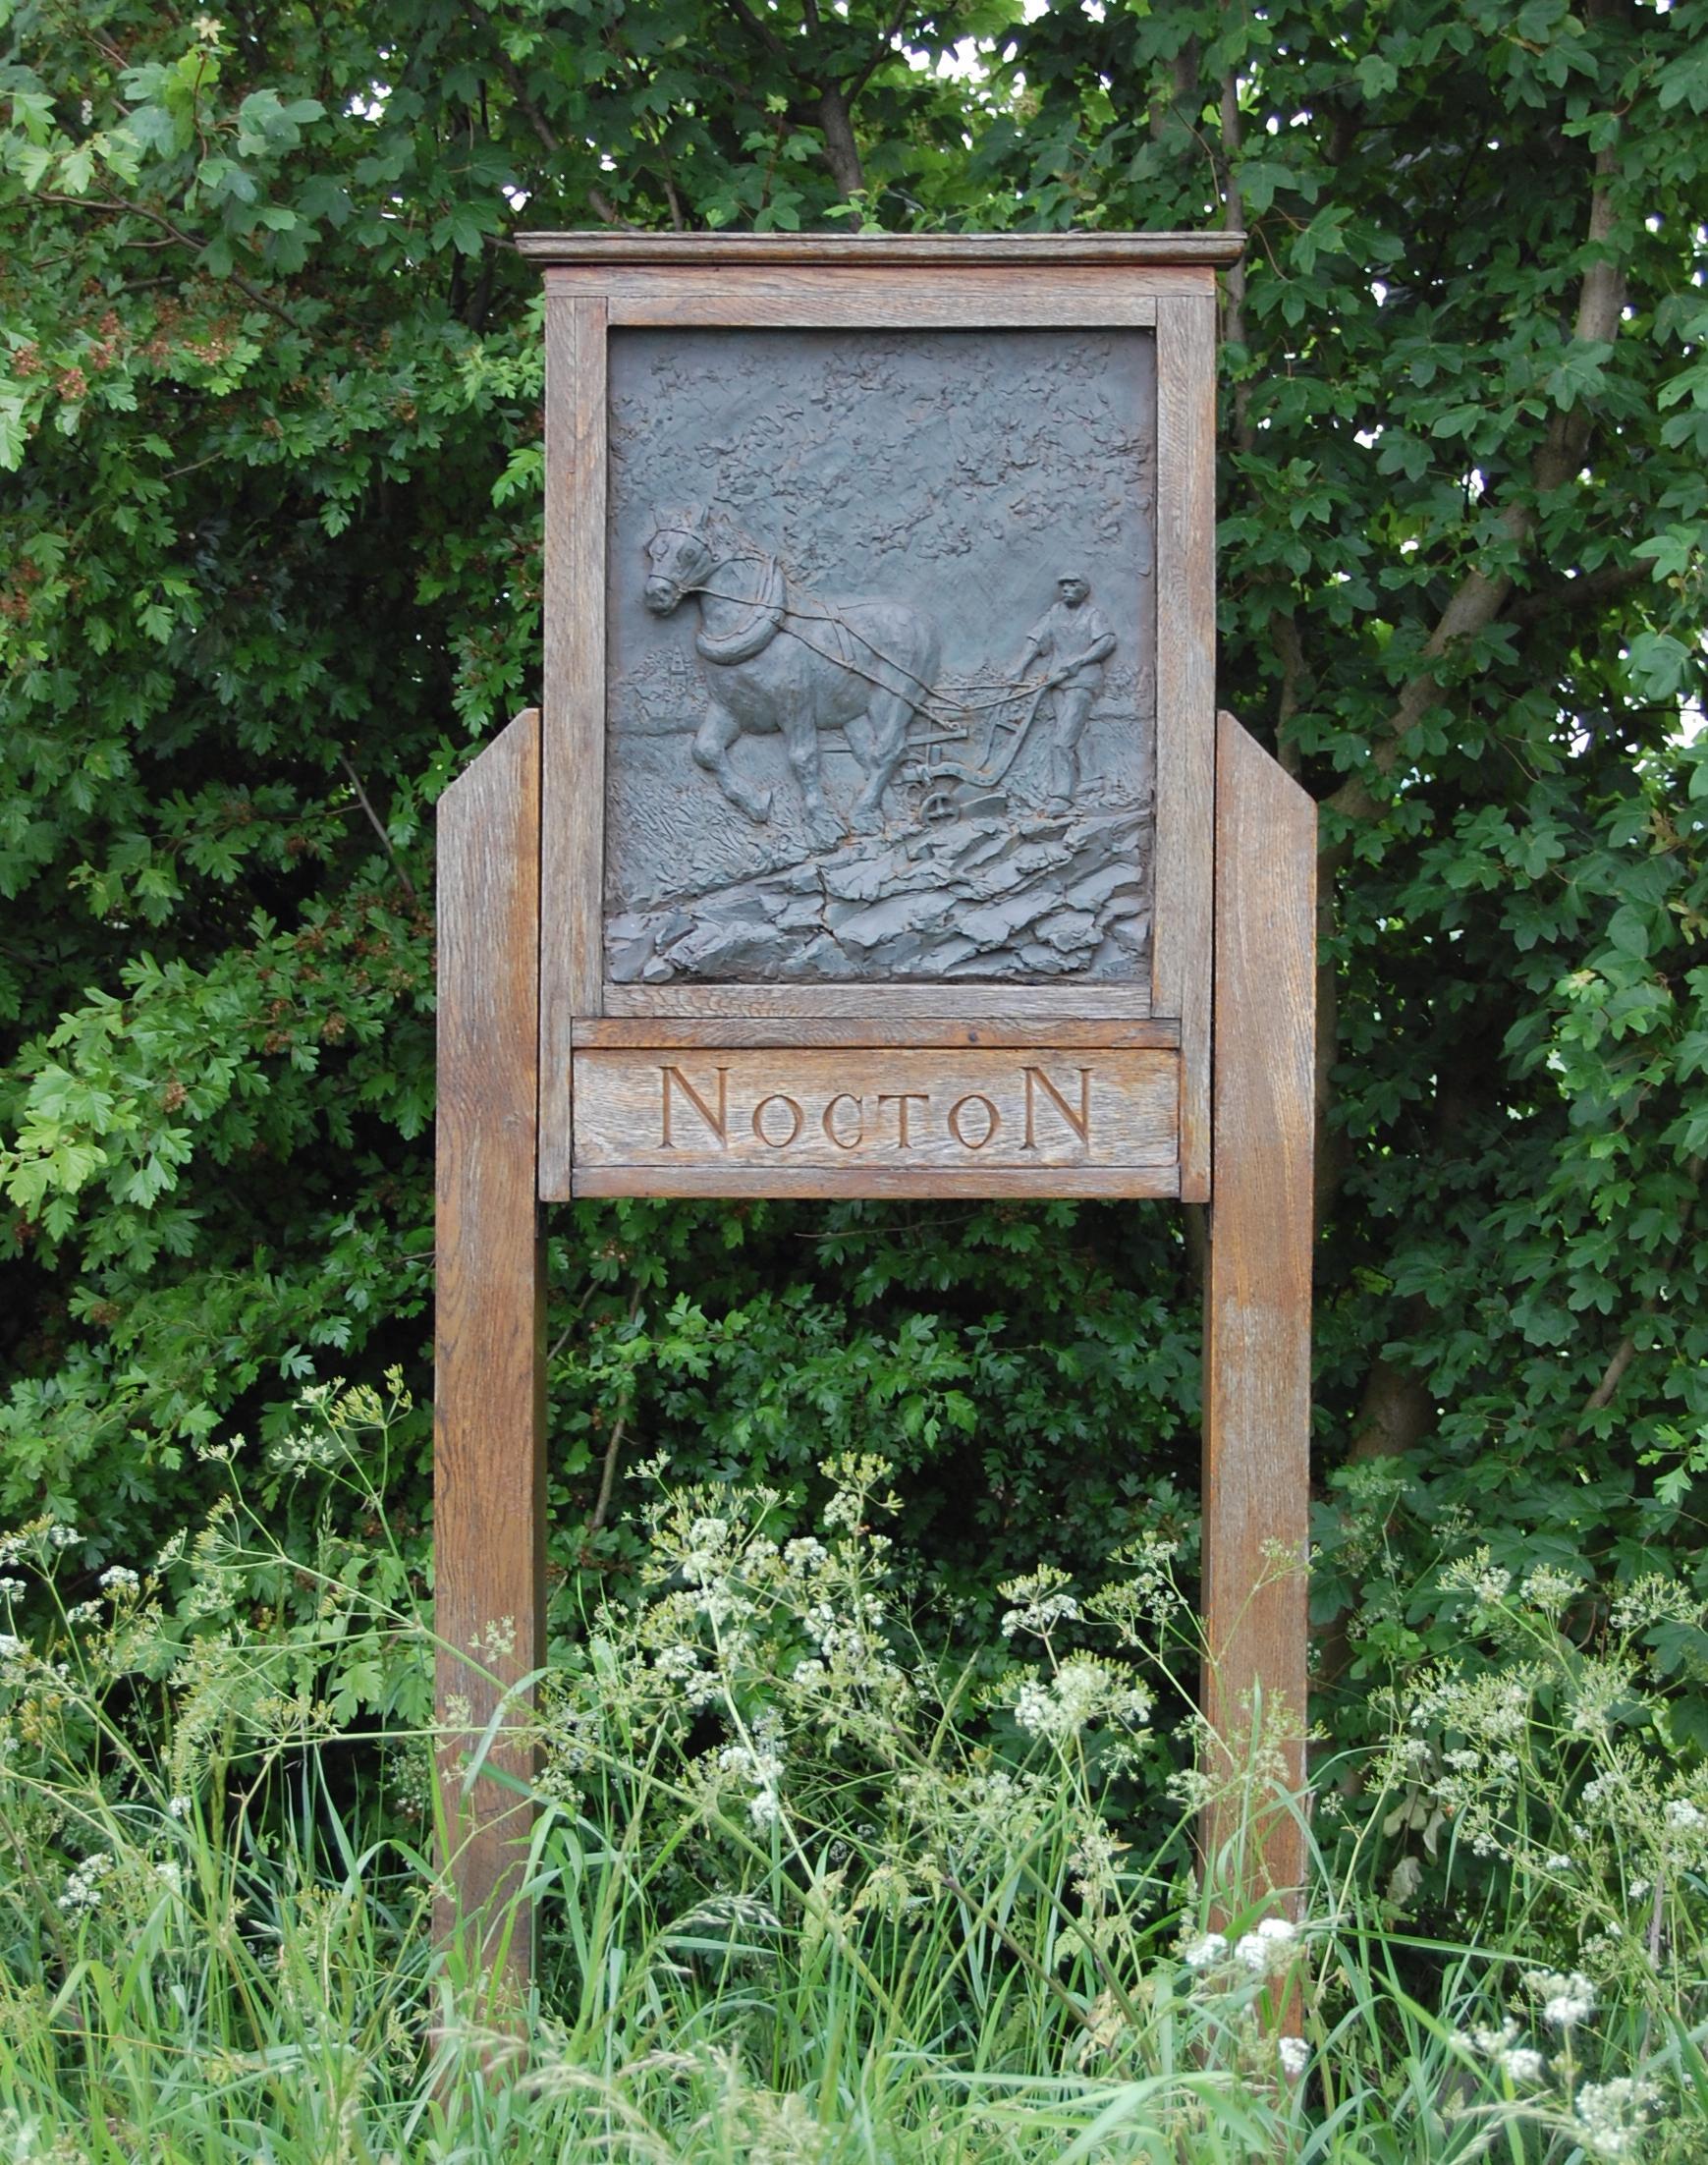 Nocton village sign